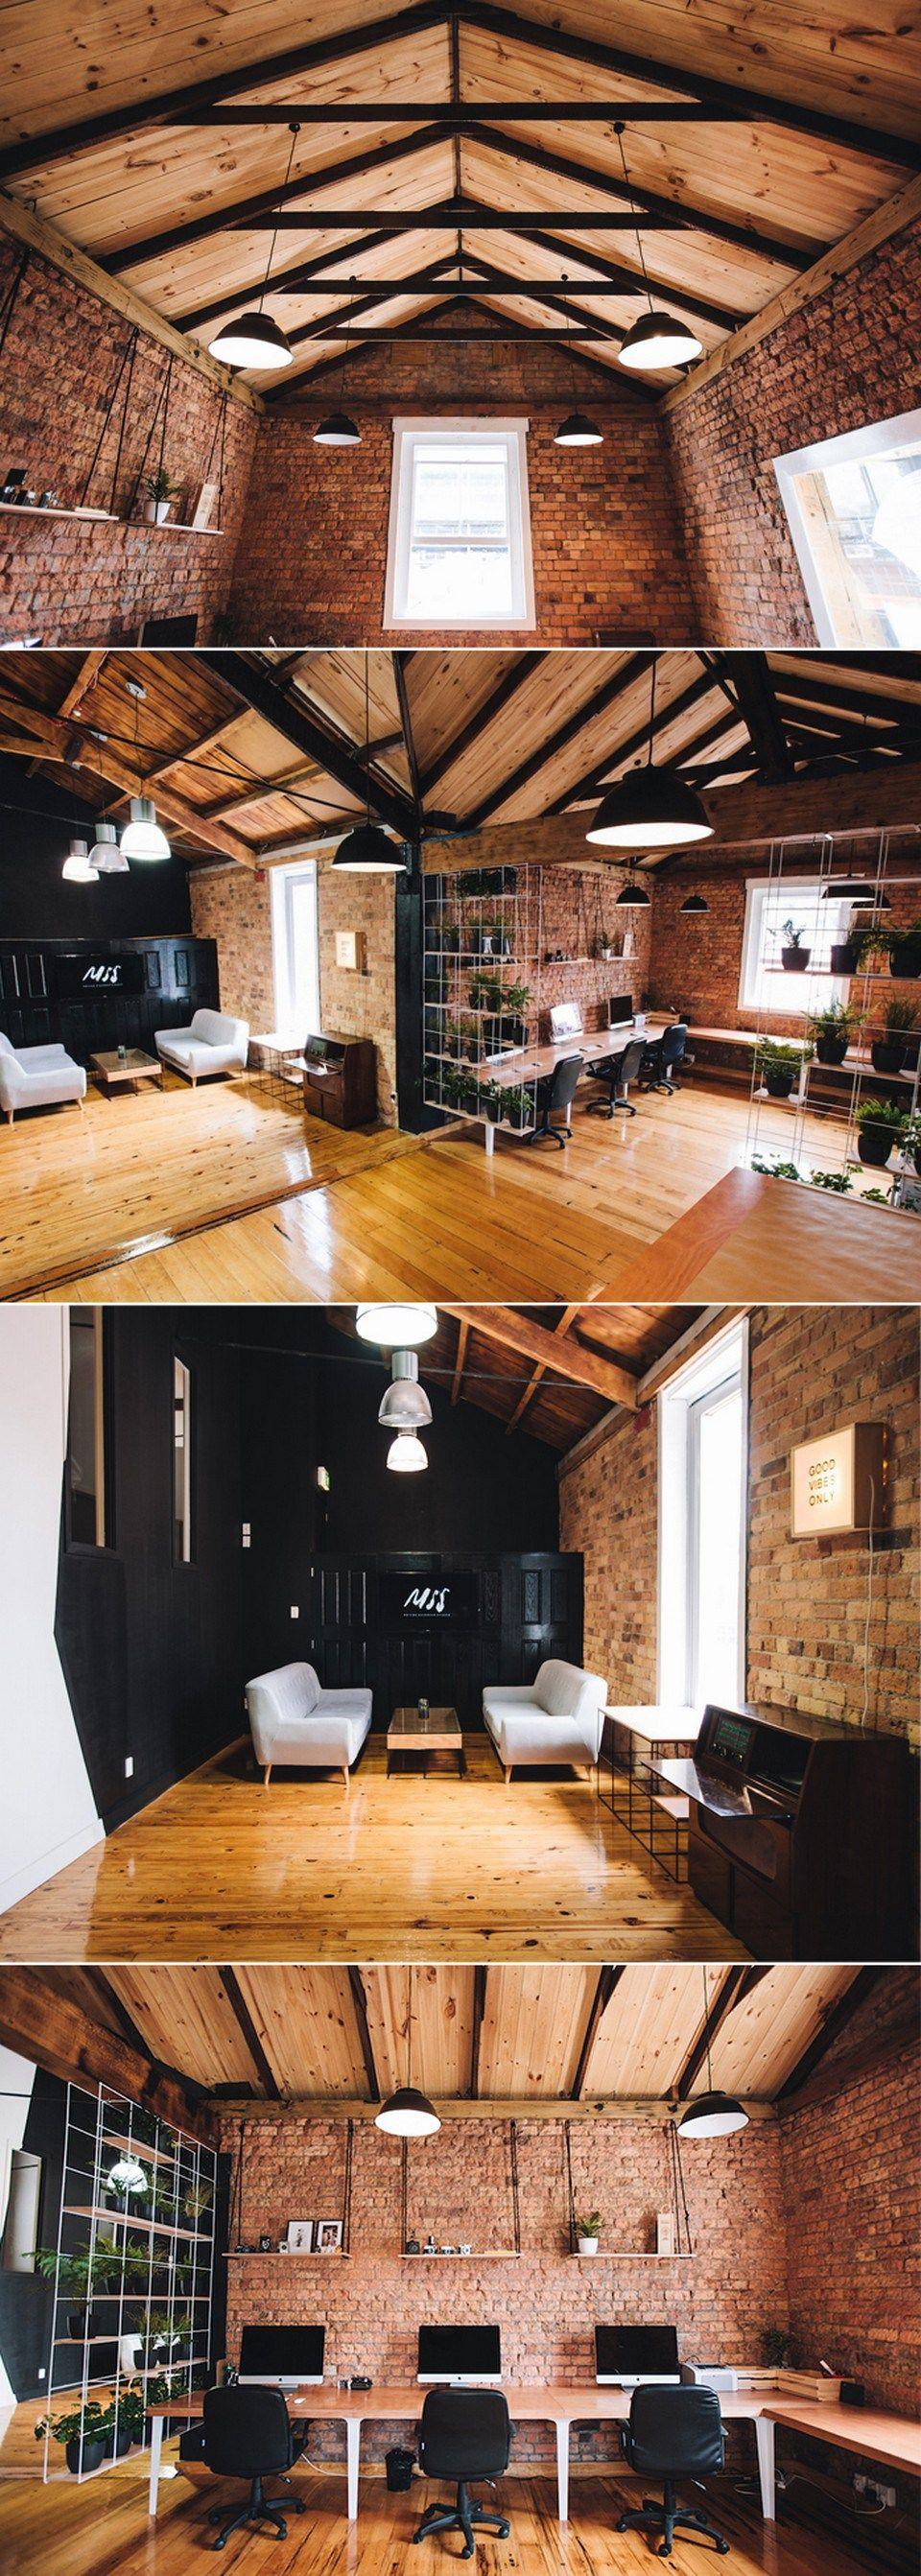 99 Awesome Small Coffee Shop Interior Design (29 ...